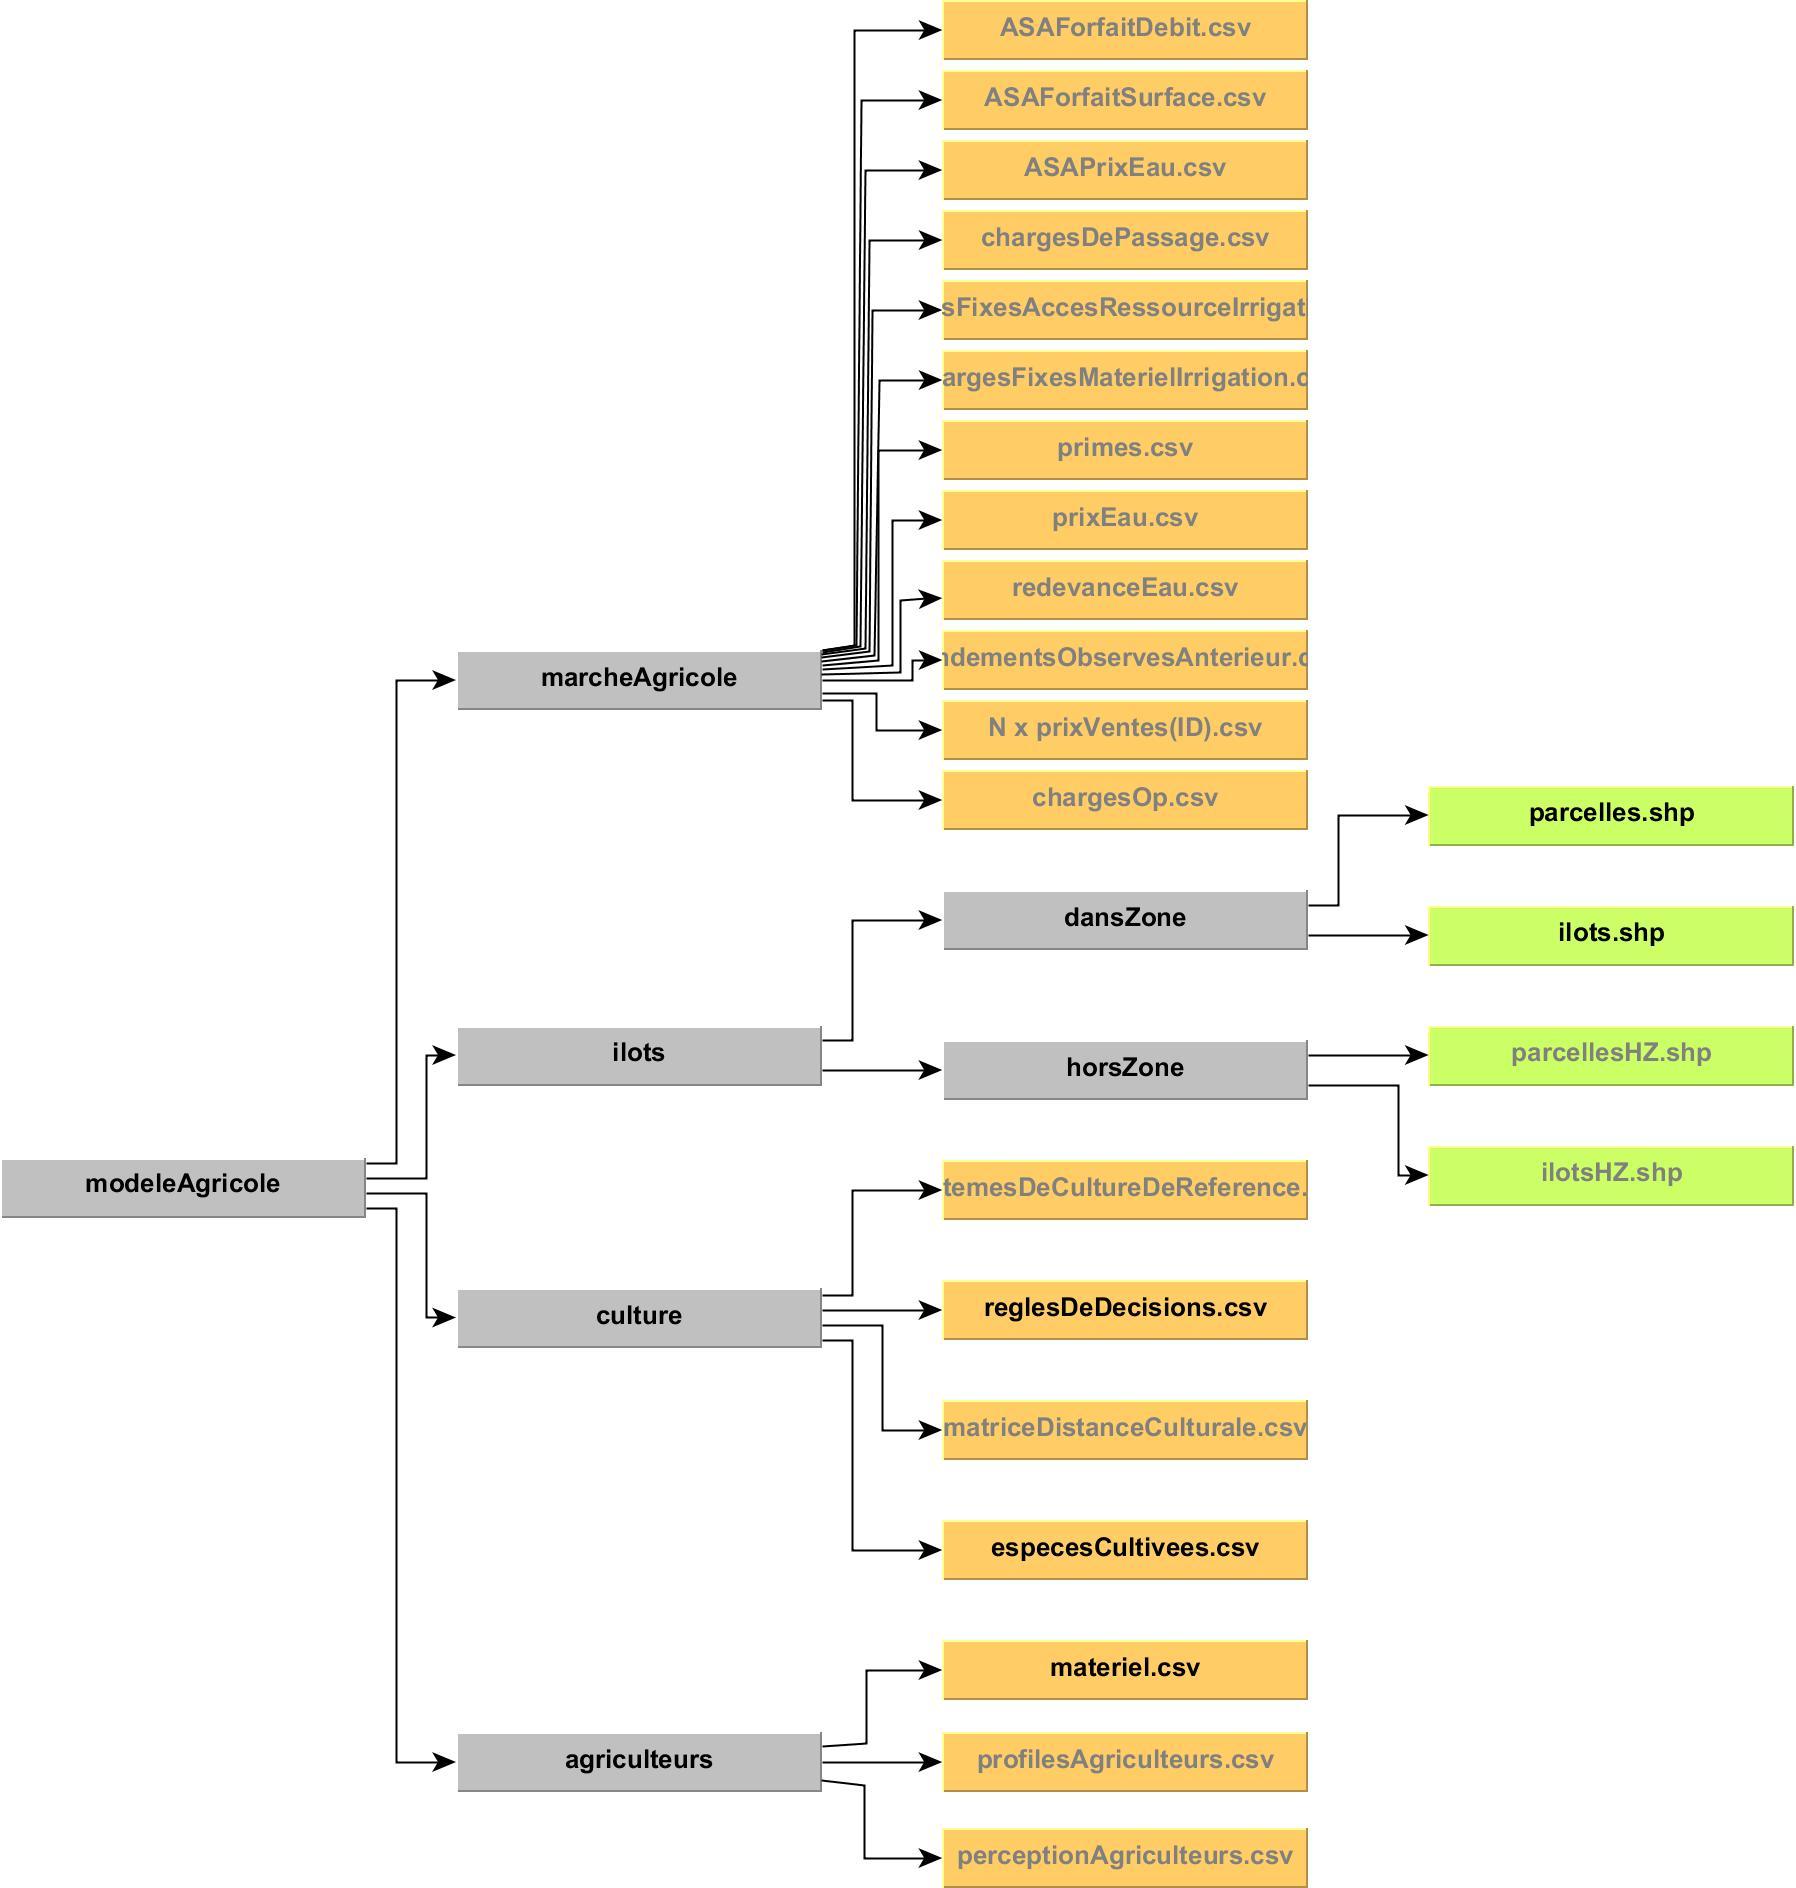 Image OrganigrammeModeleAgricole